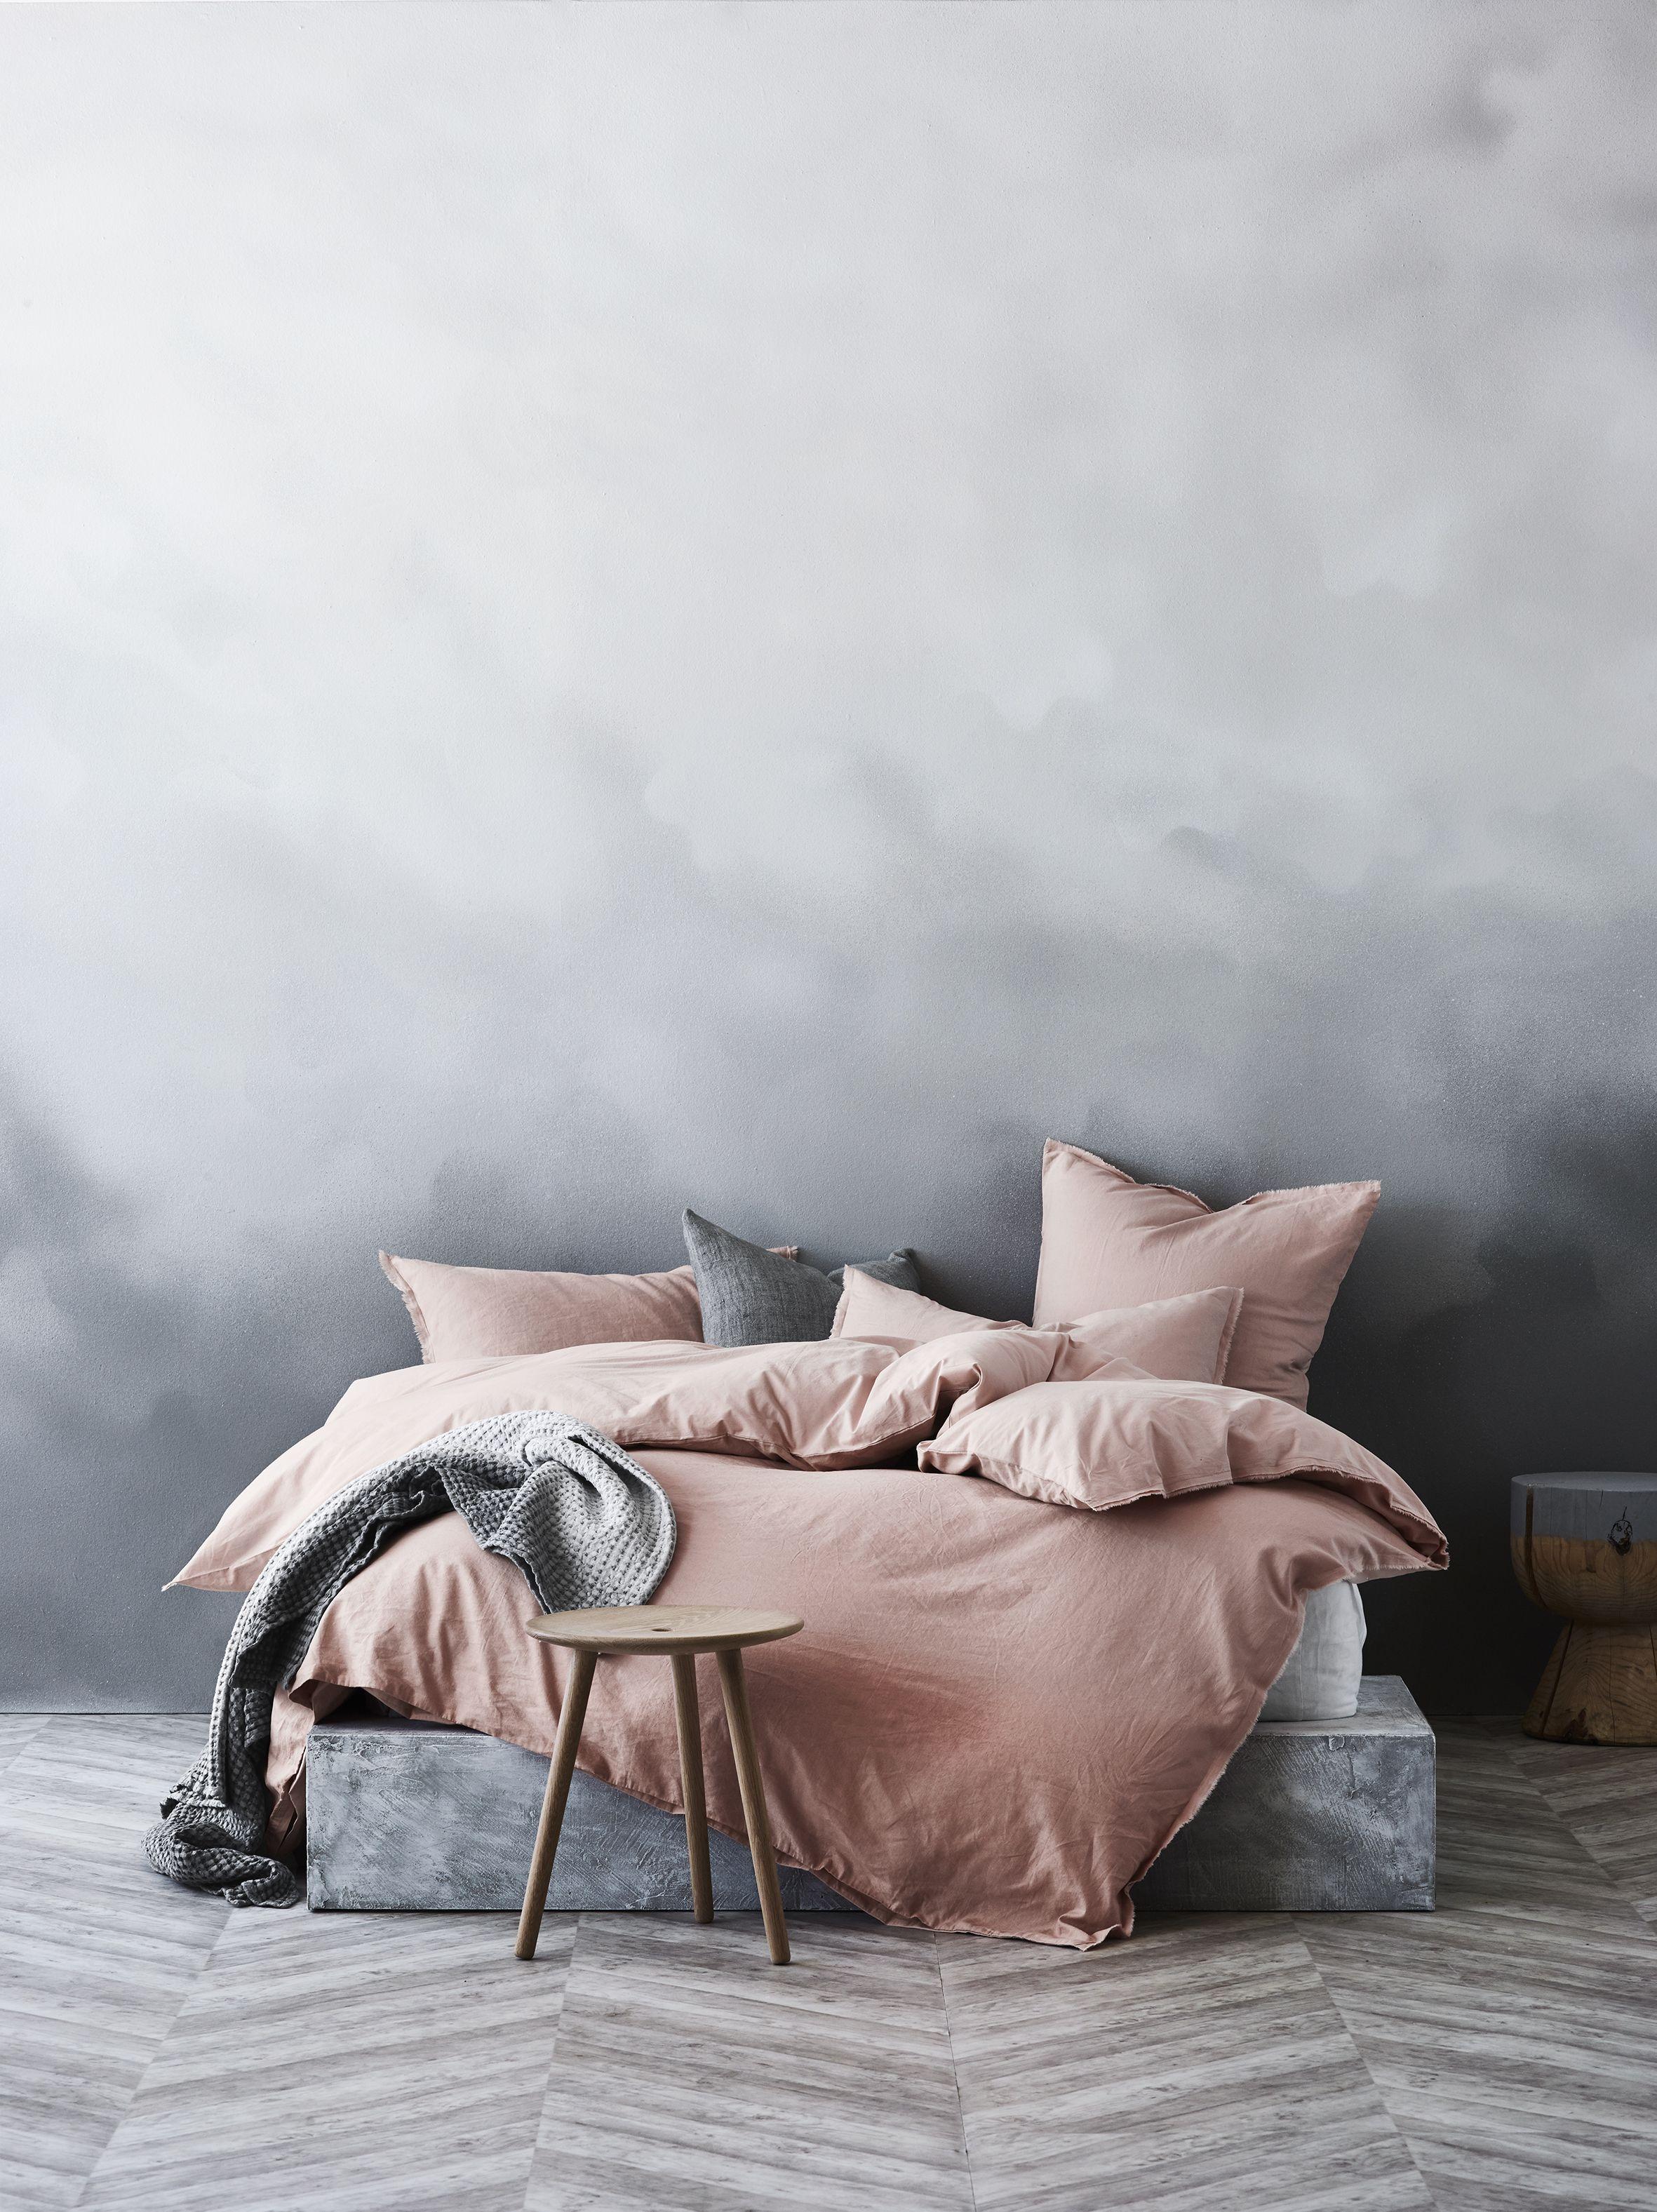 Maison Fringe quilt cover in Rose Dust 05098d5bbd